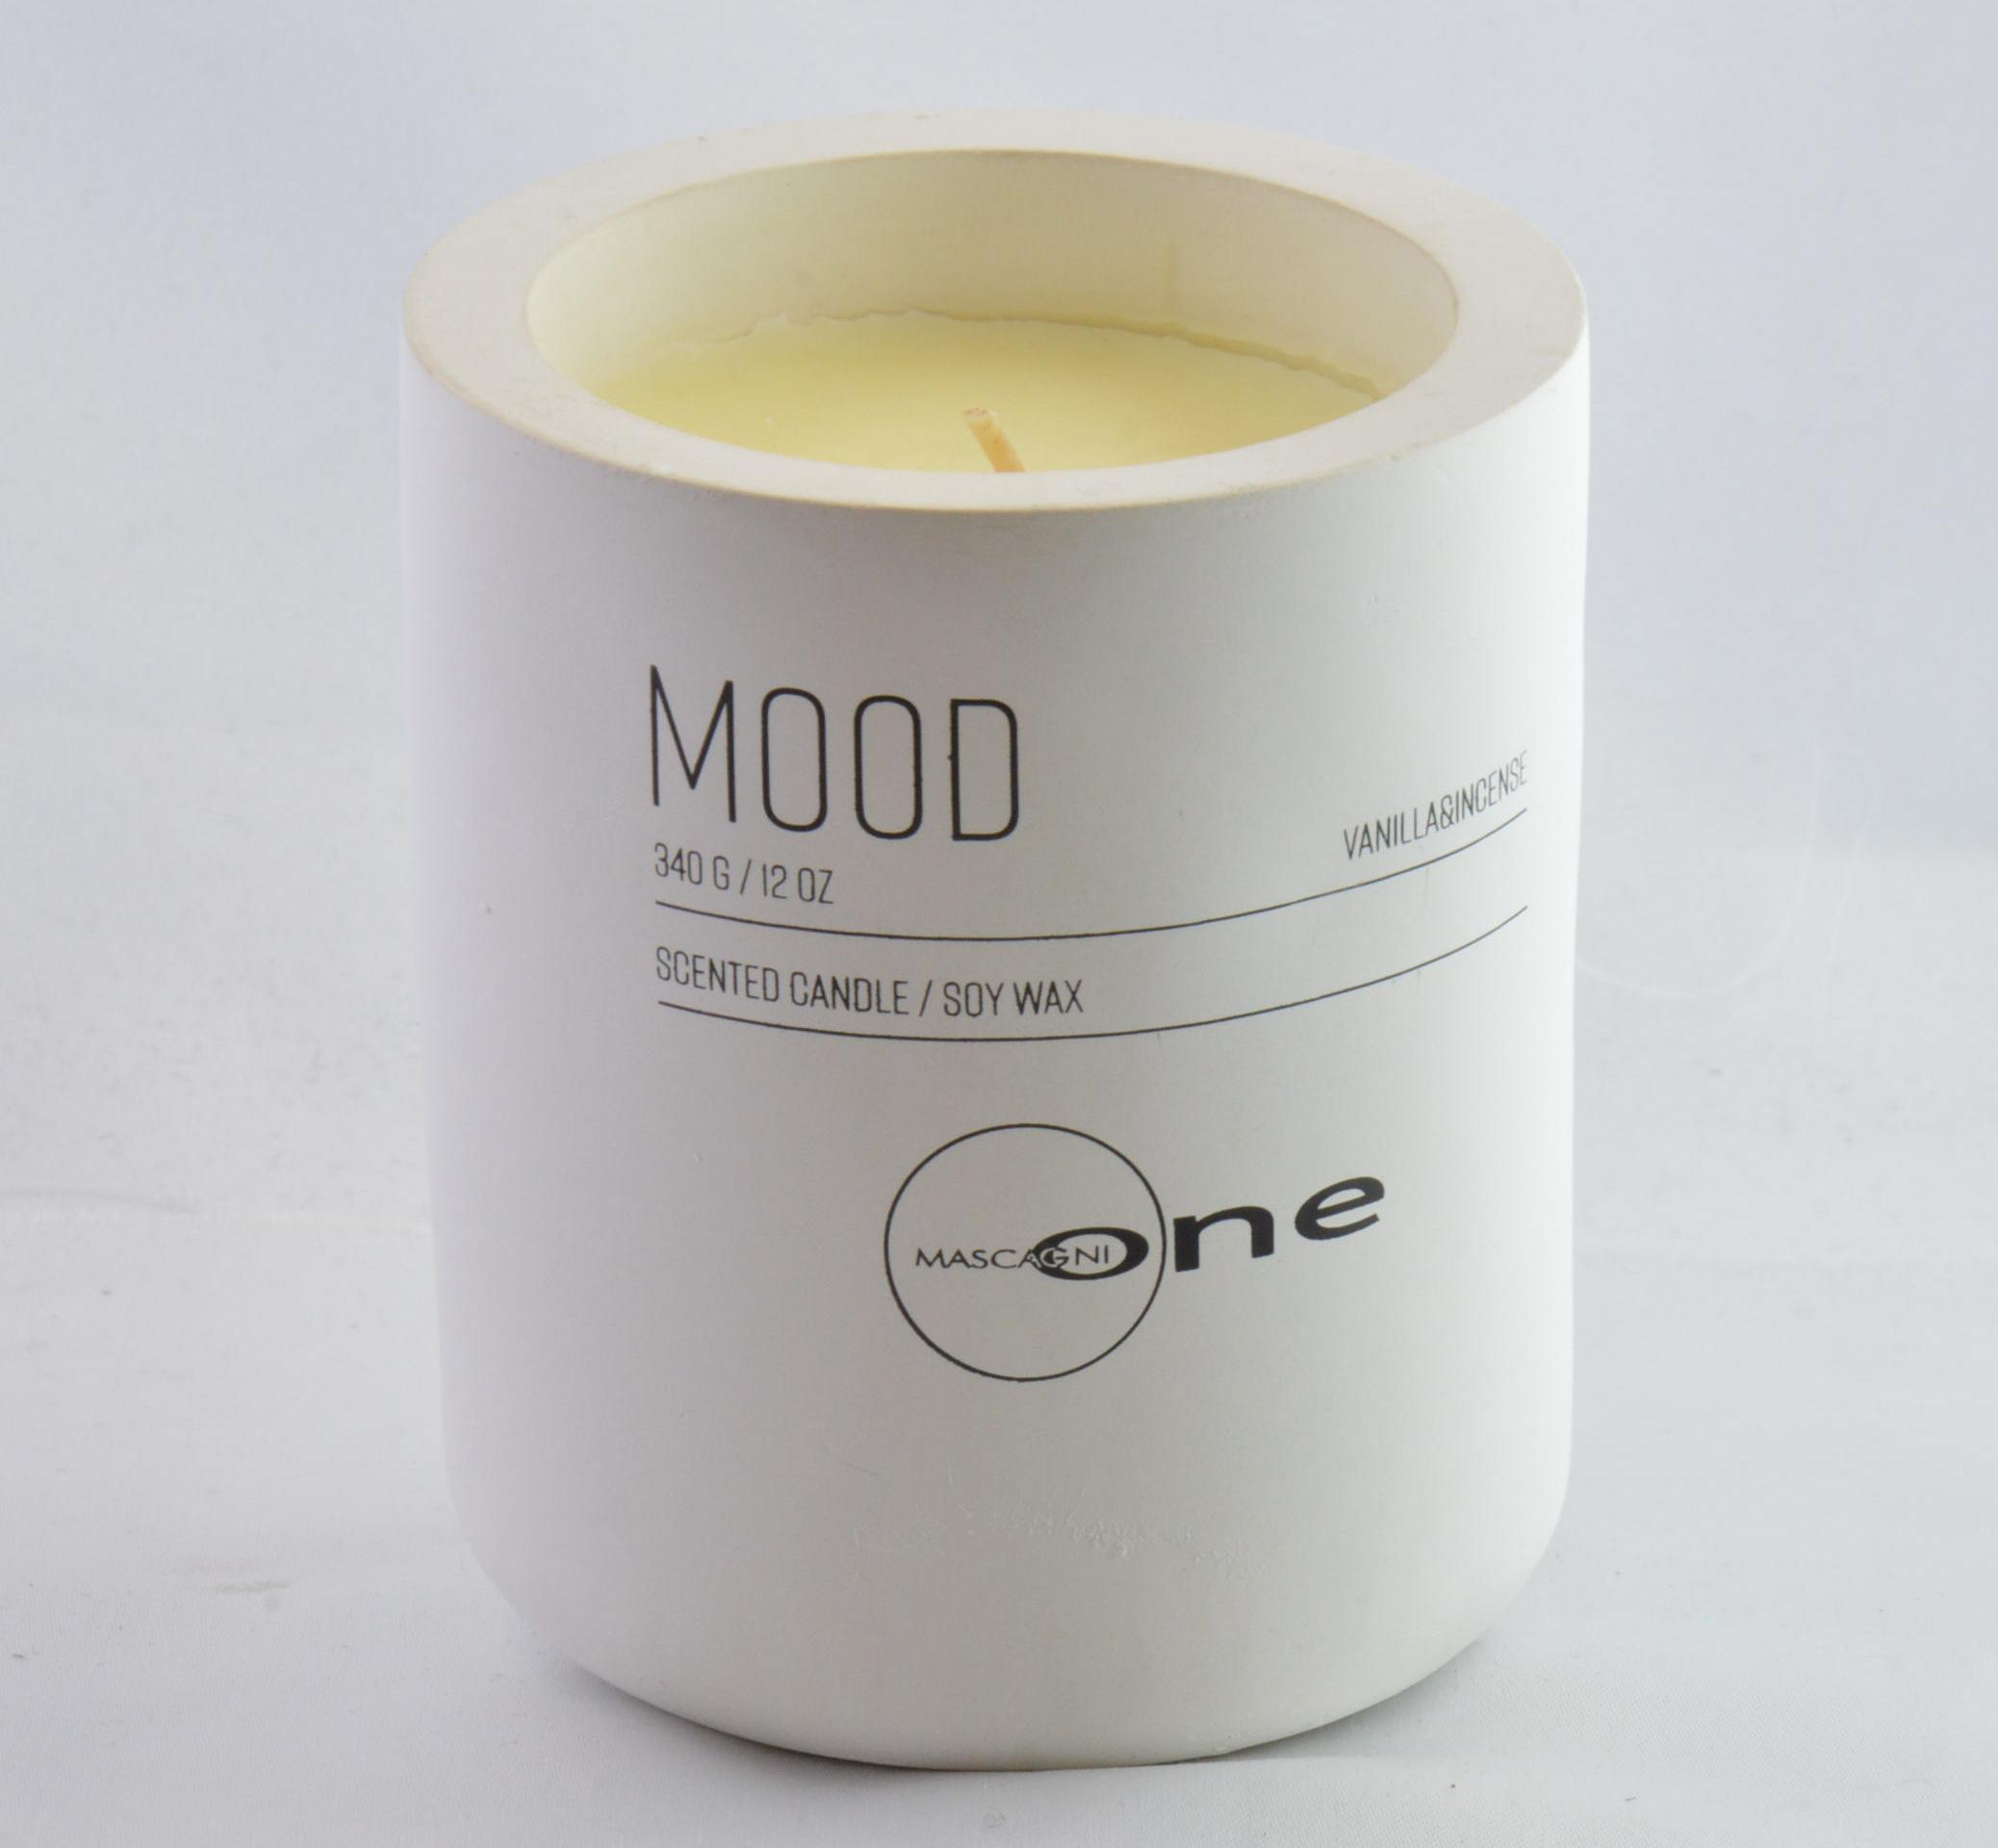 Candela Mascagni One cod. O1320 bianco Mood Vanilla & incense